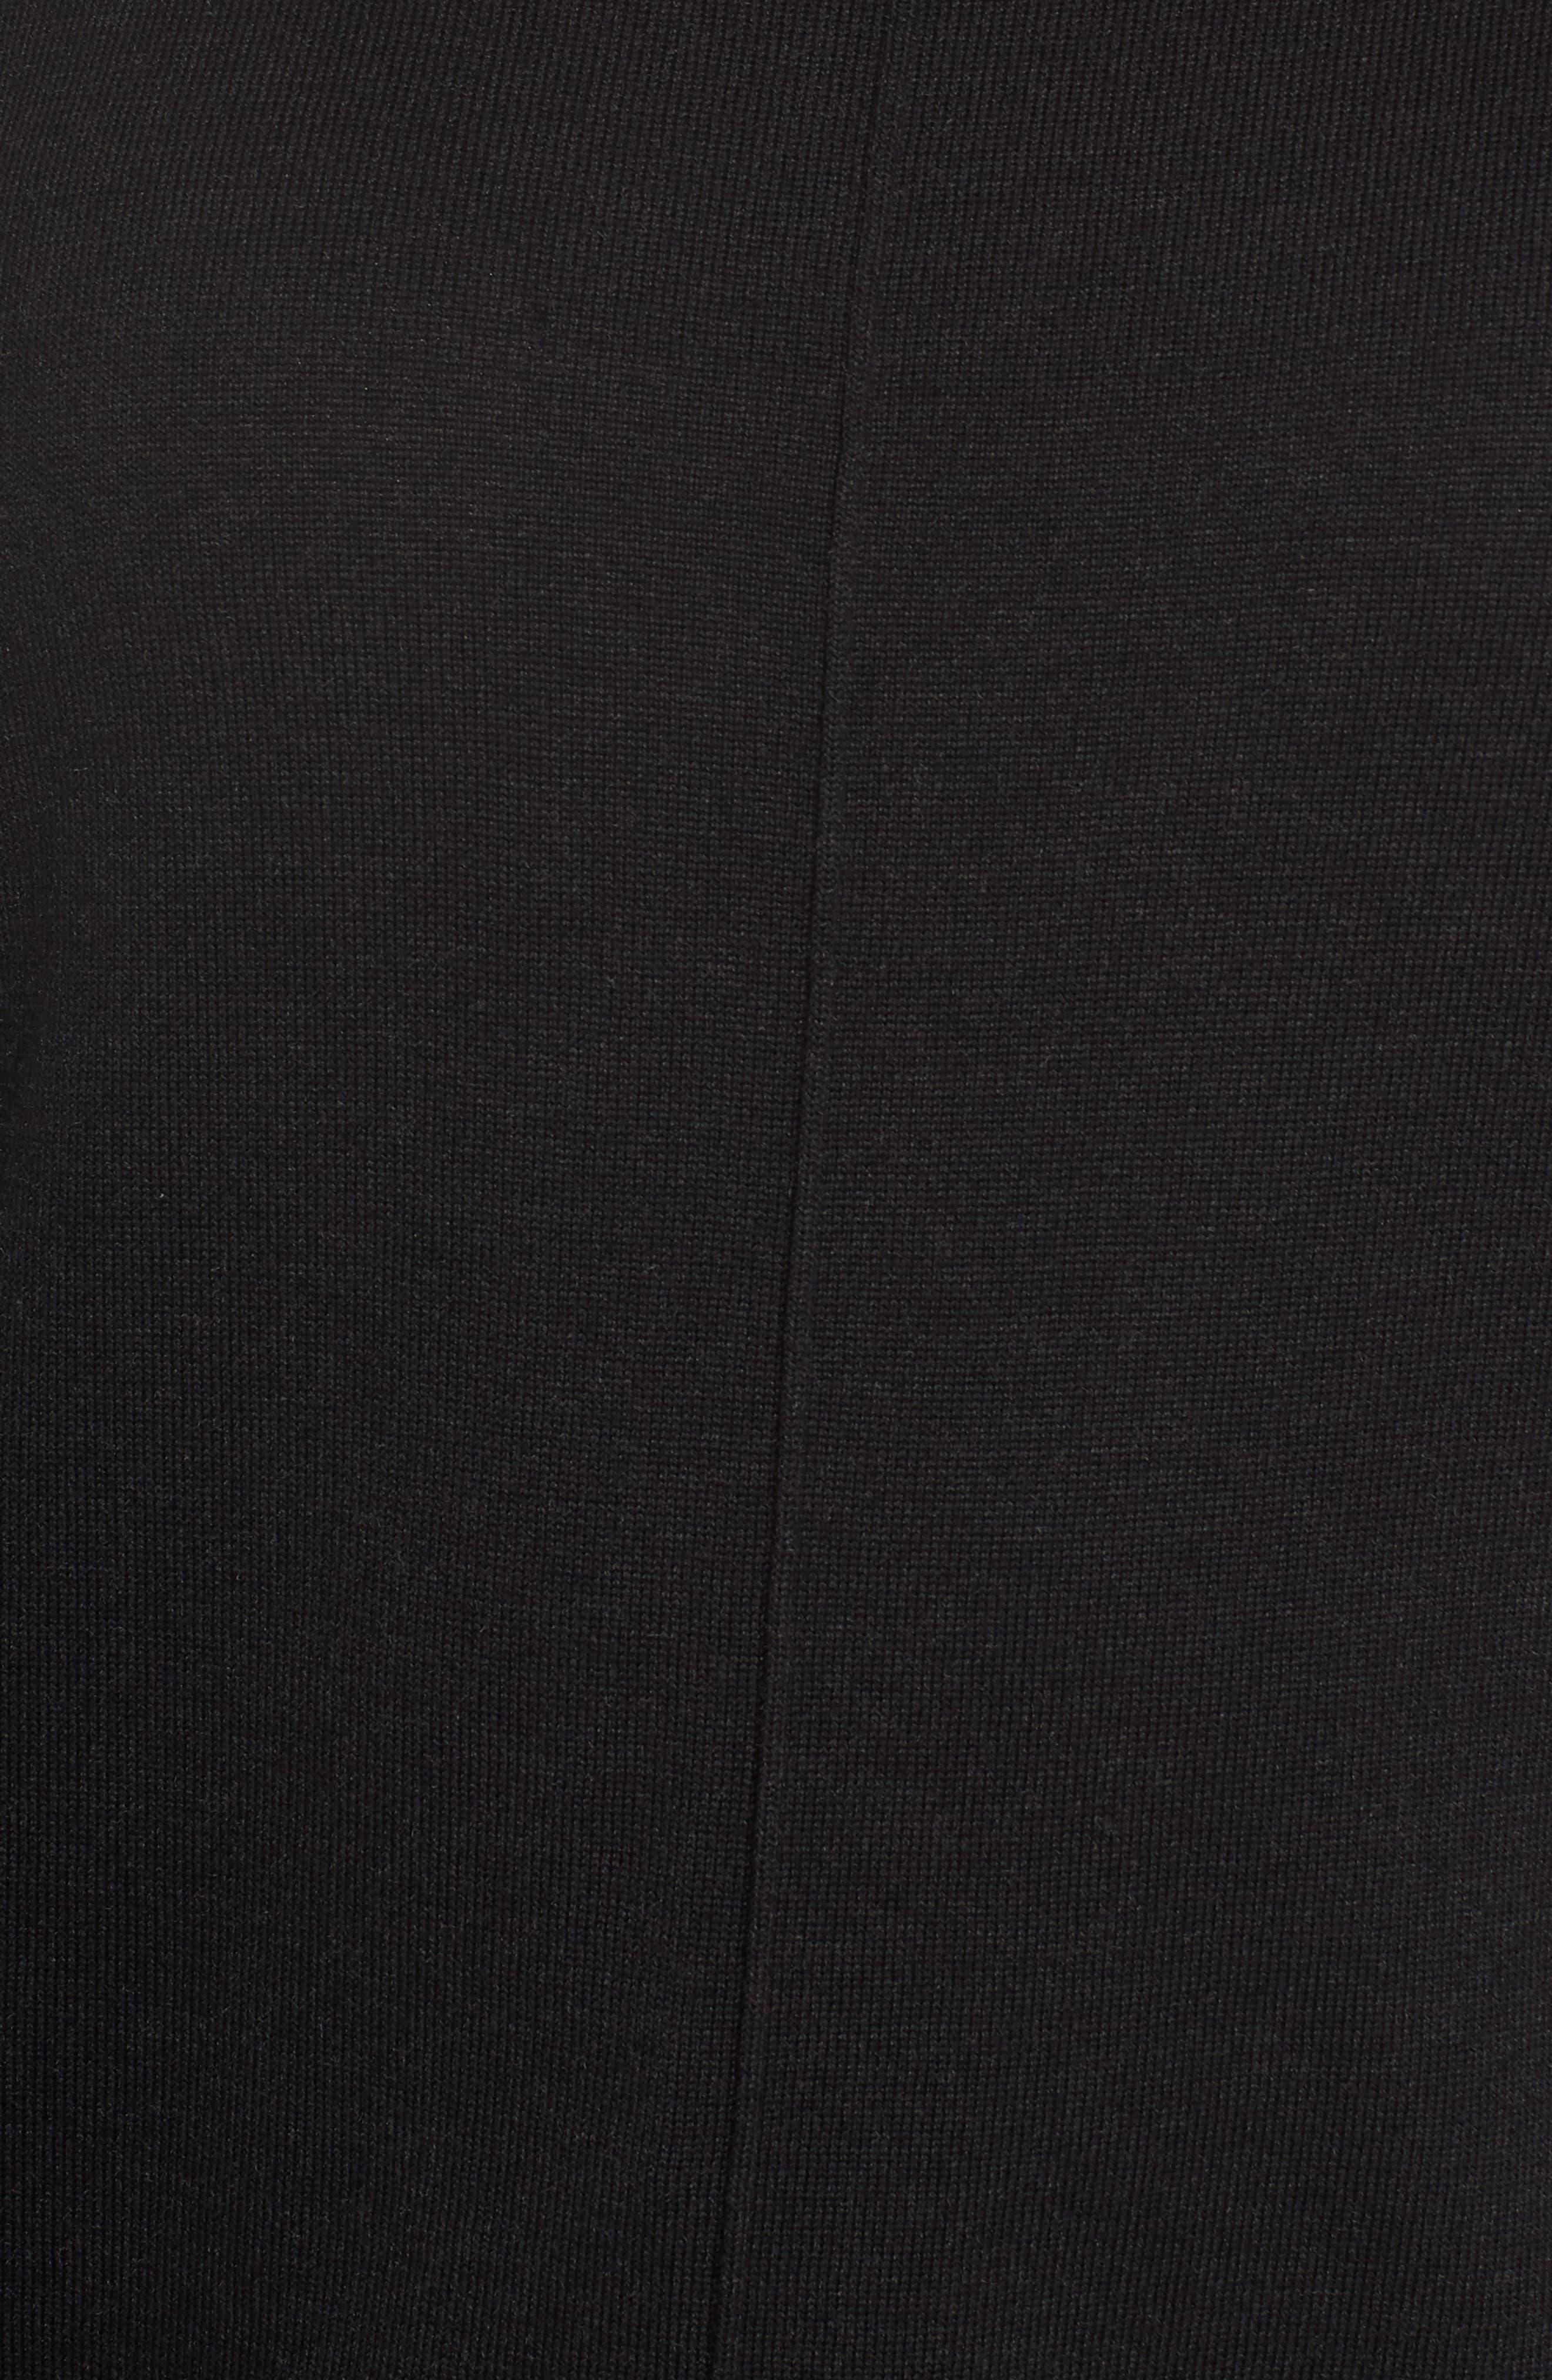 Mix Gauge Zip Cuff Sweater,                             Alternate thumbnail 5, color,                             001